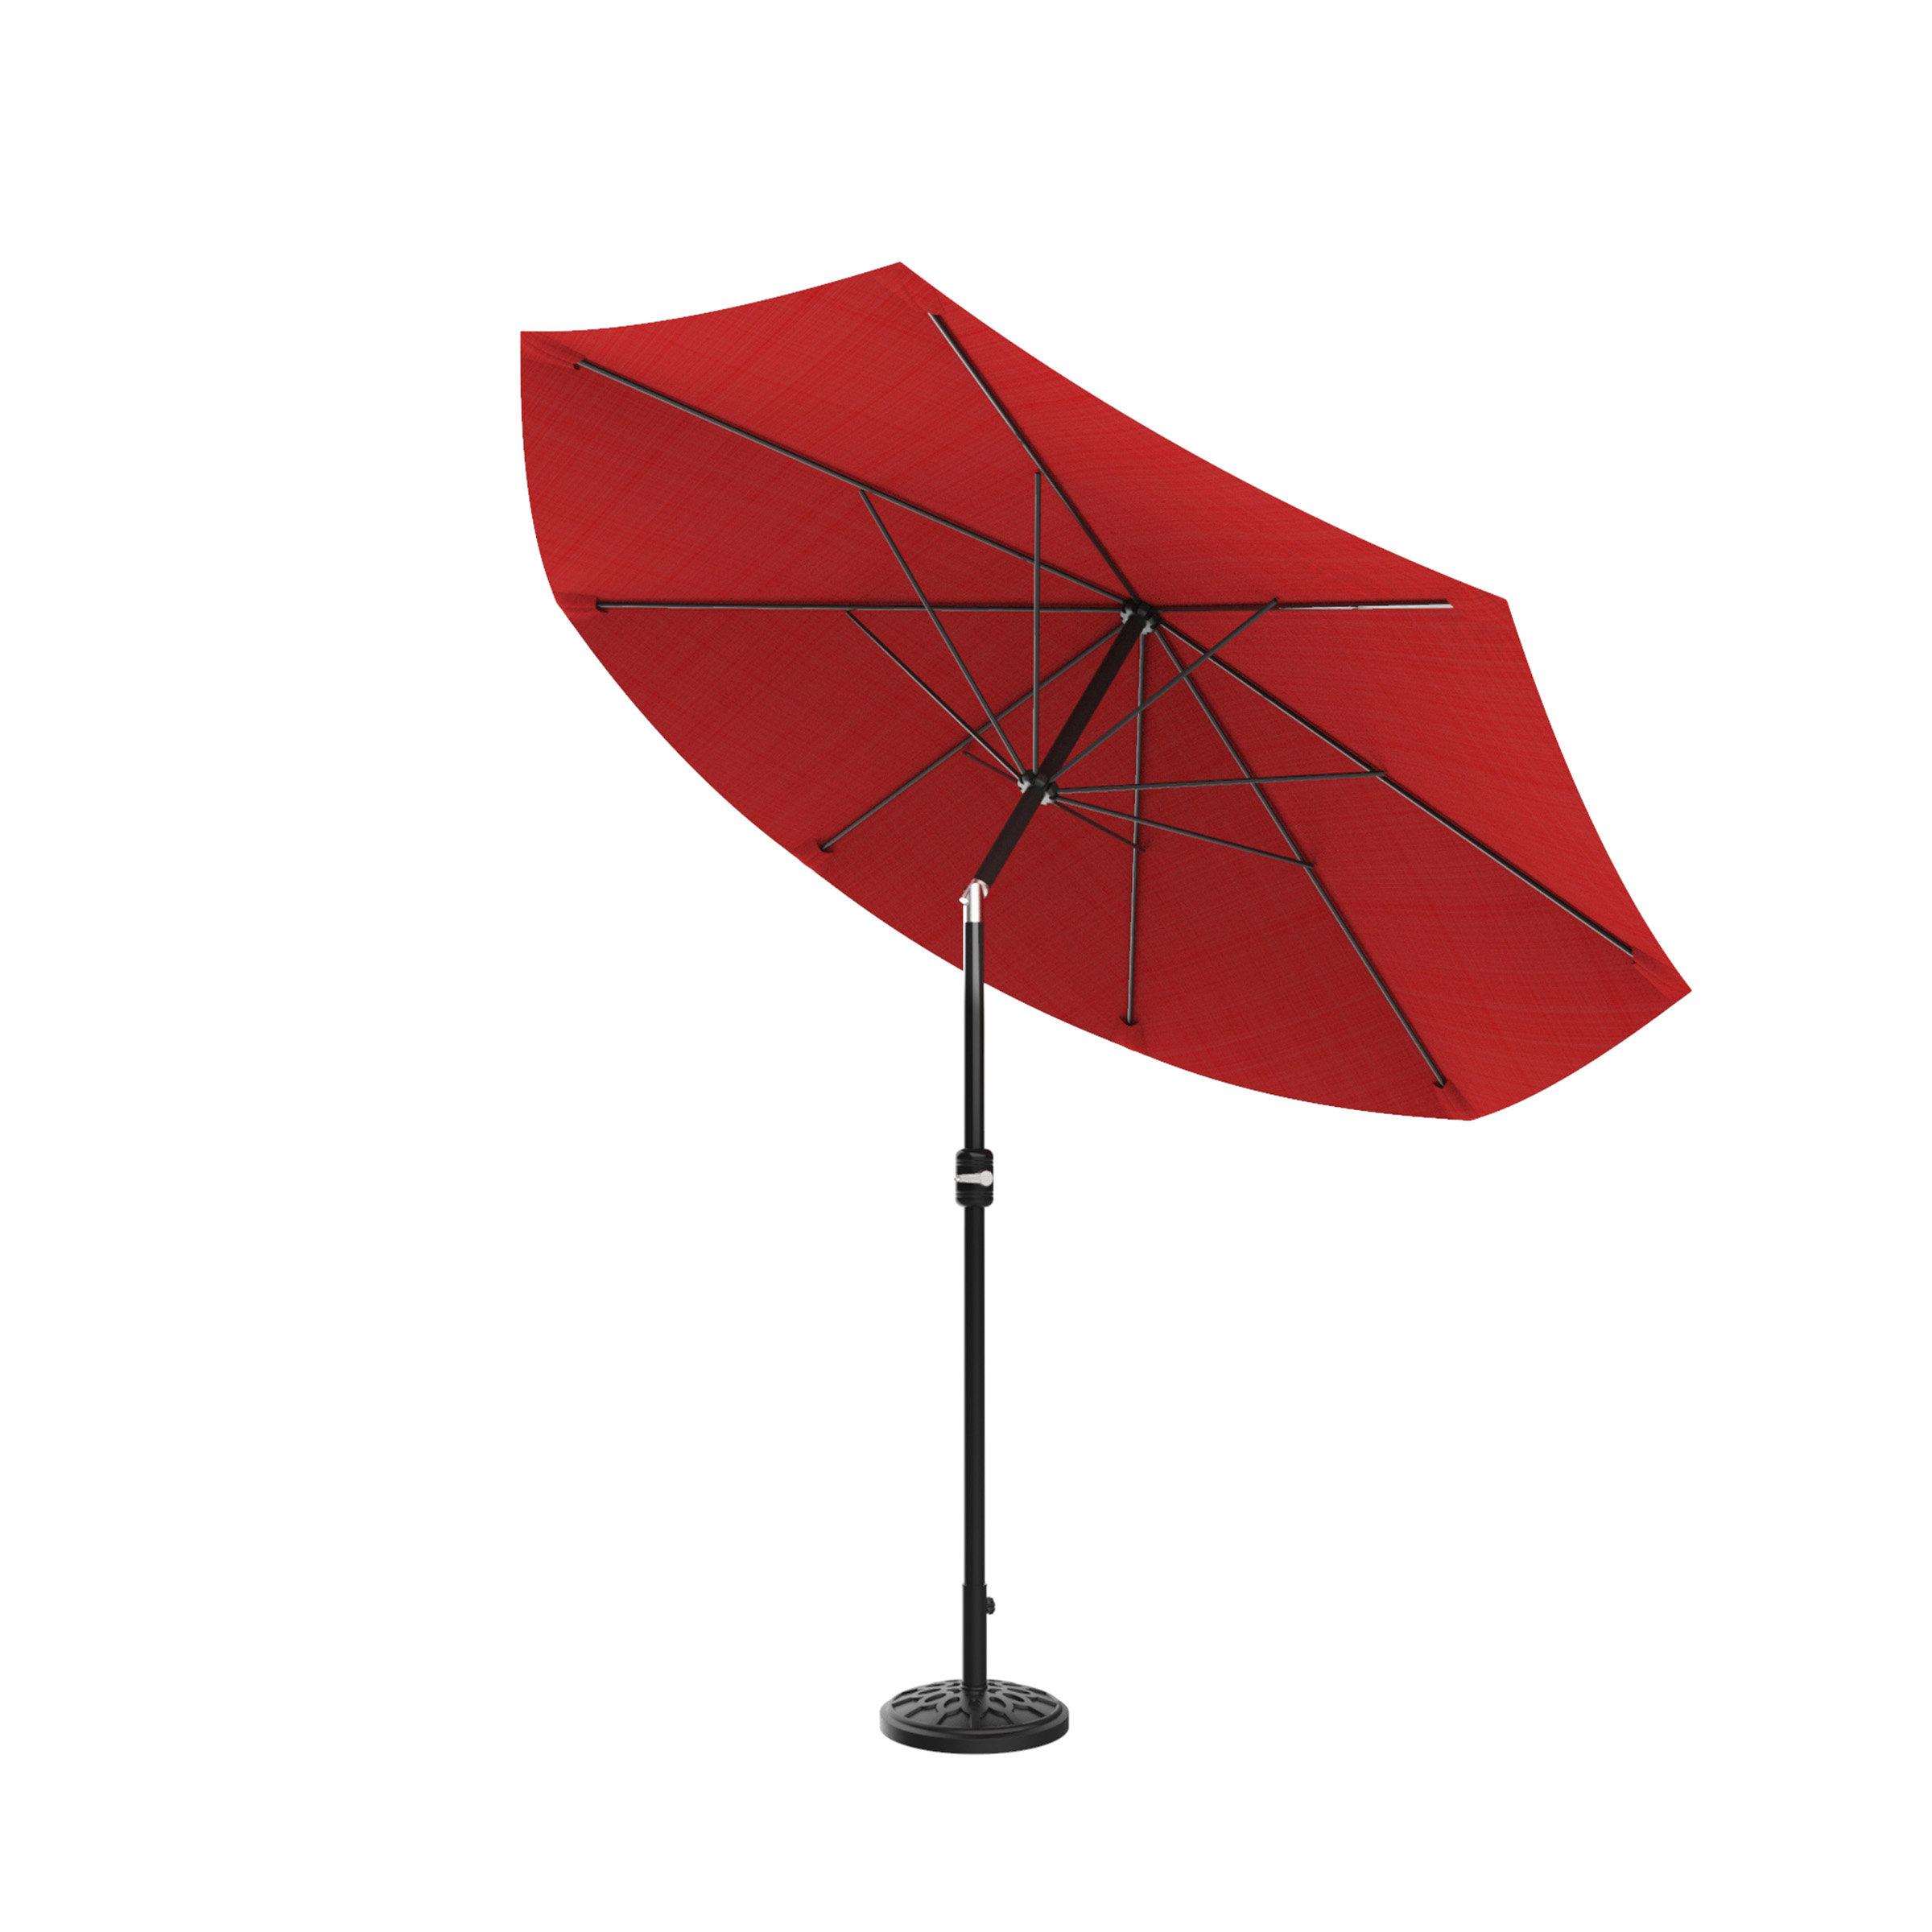 Kelton Market Umbrellas Within Popular Beachcrest Home Kelton 10' Market Umbrella (Gallery 5 of 20)